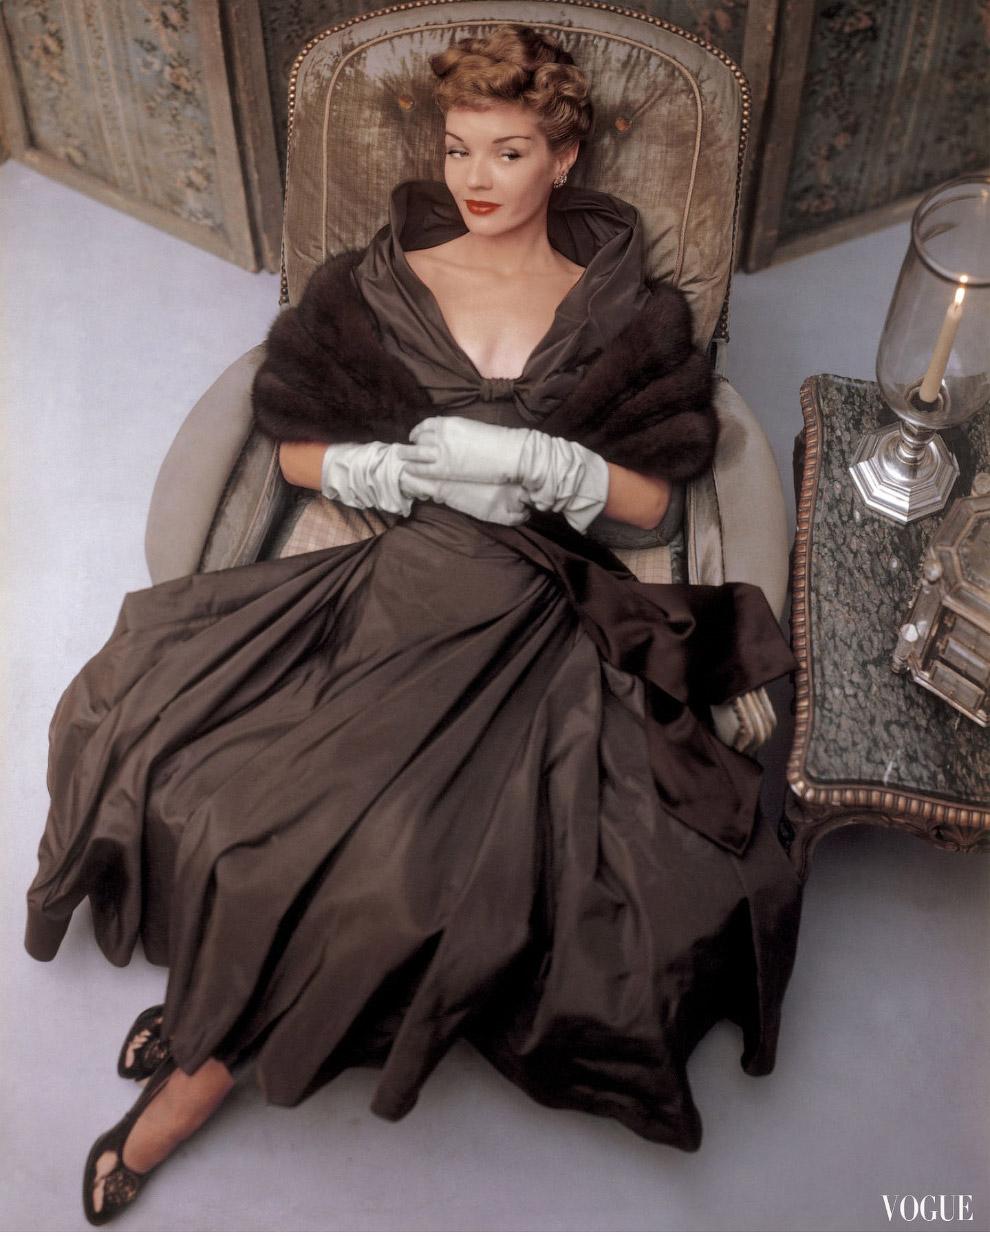 24. Бетти Бриджес в костюме от Истер Дороти и перчатках от Эрис, 1948 год.